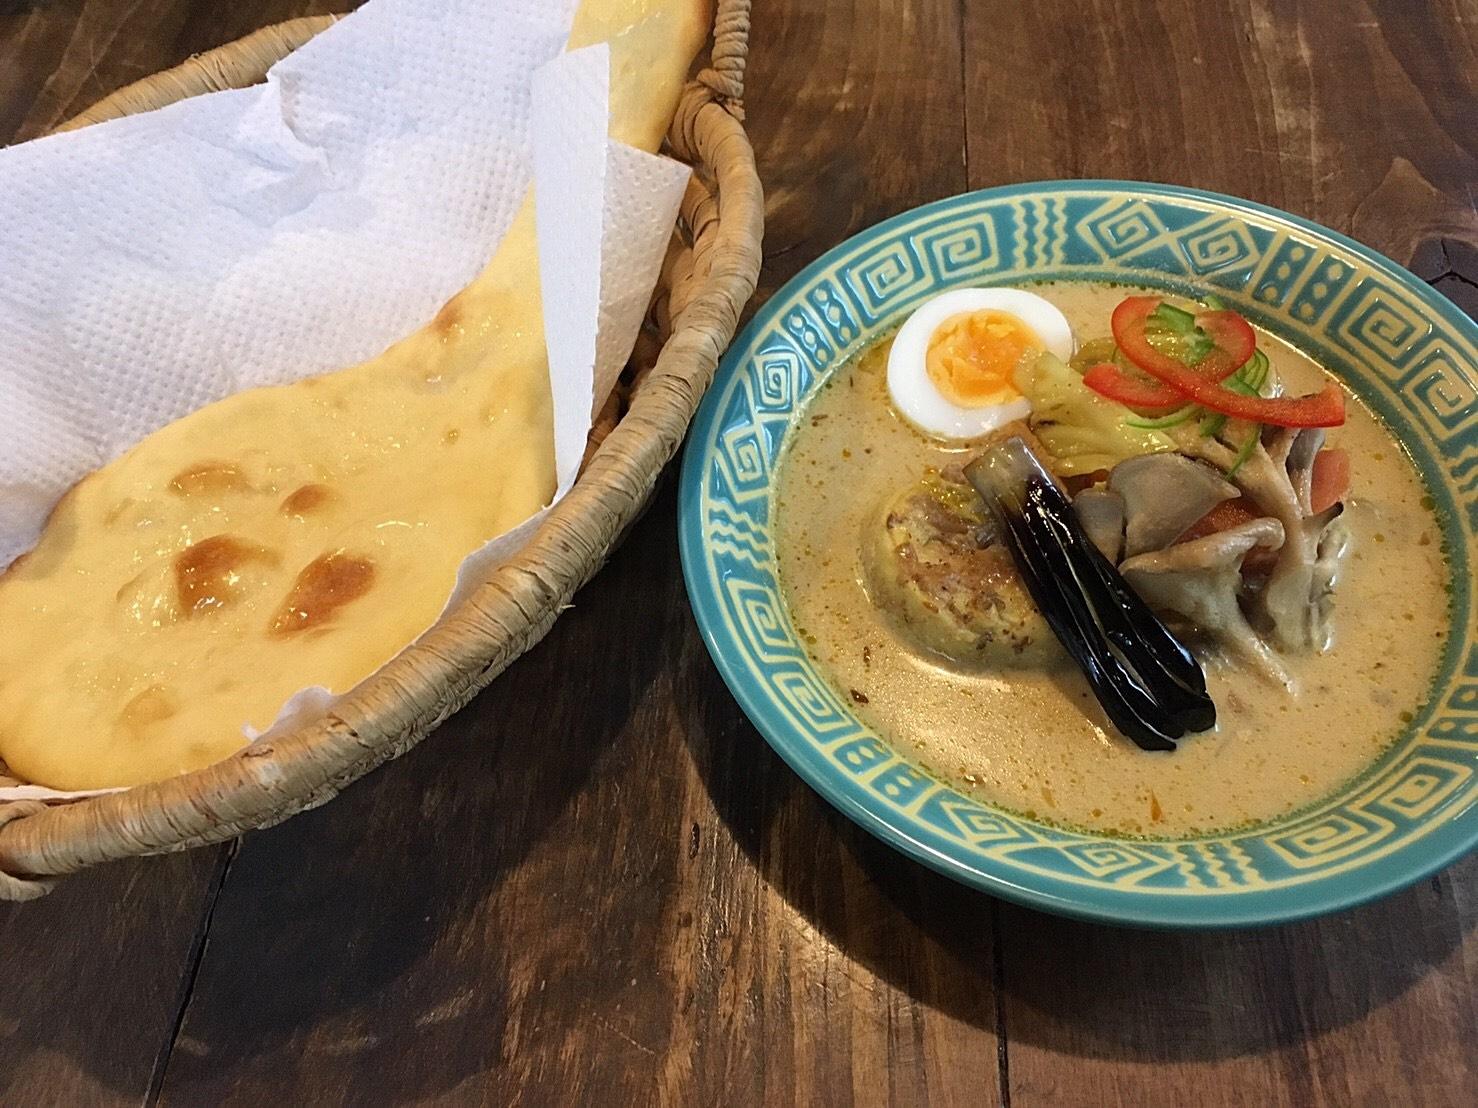 cafe jorro 白カレー 鶏野菜withナン.JPG